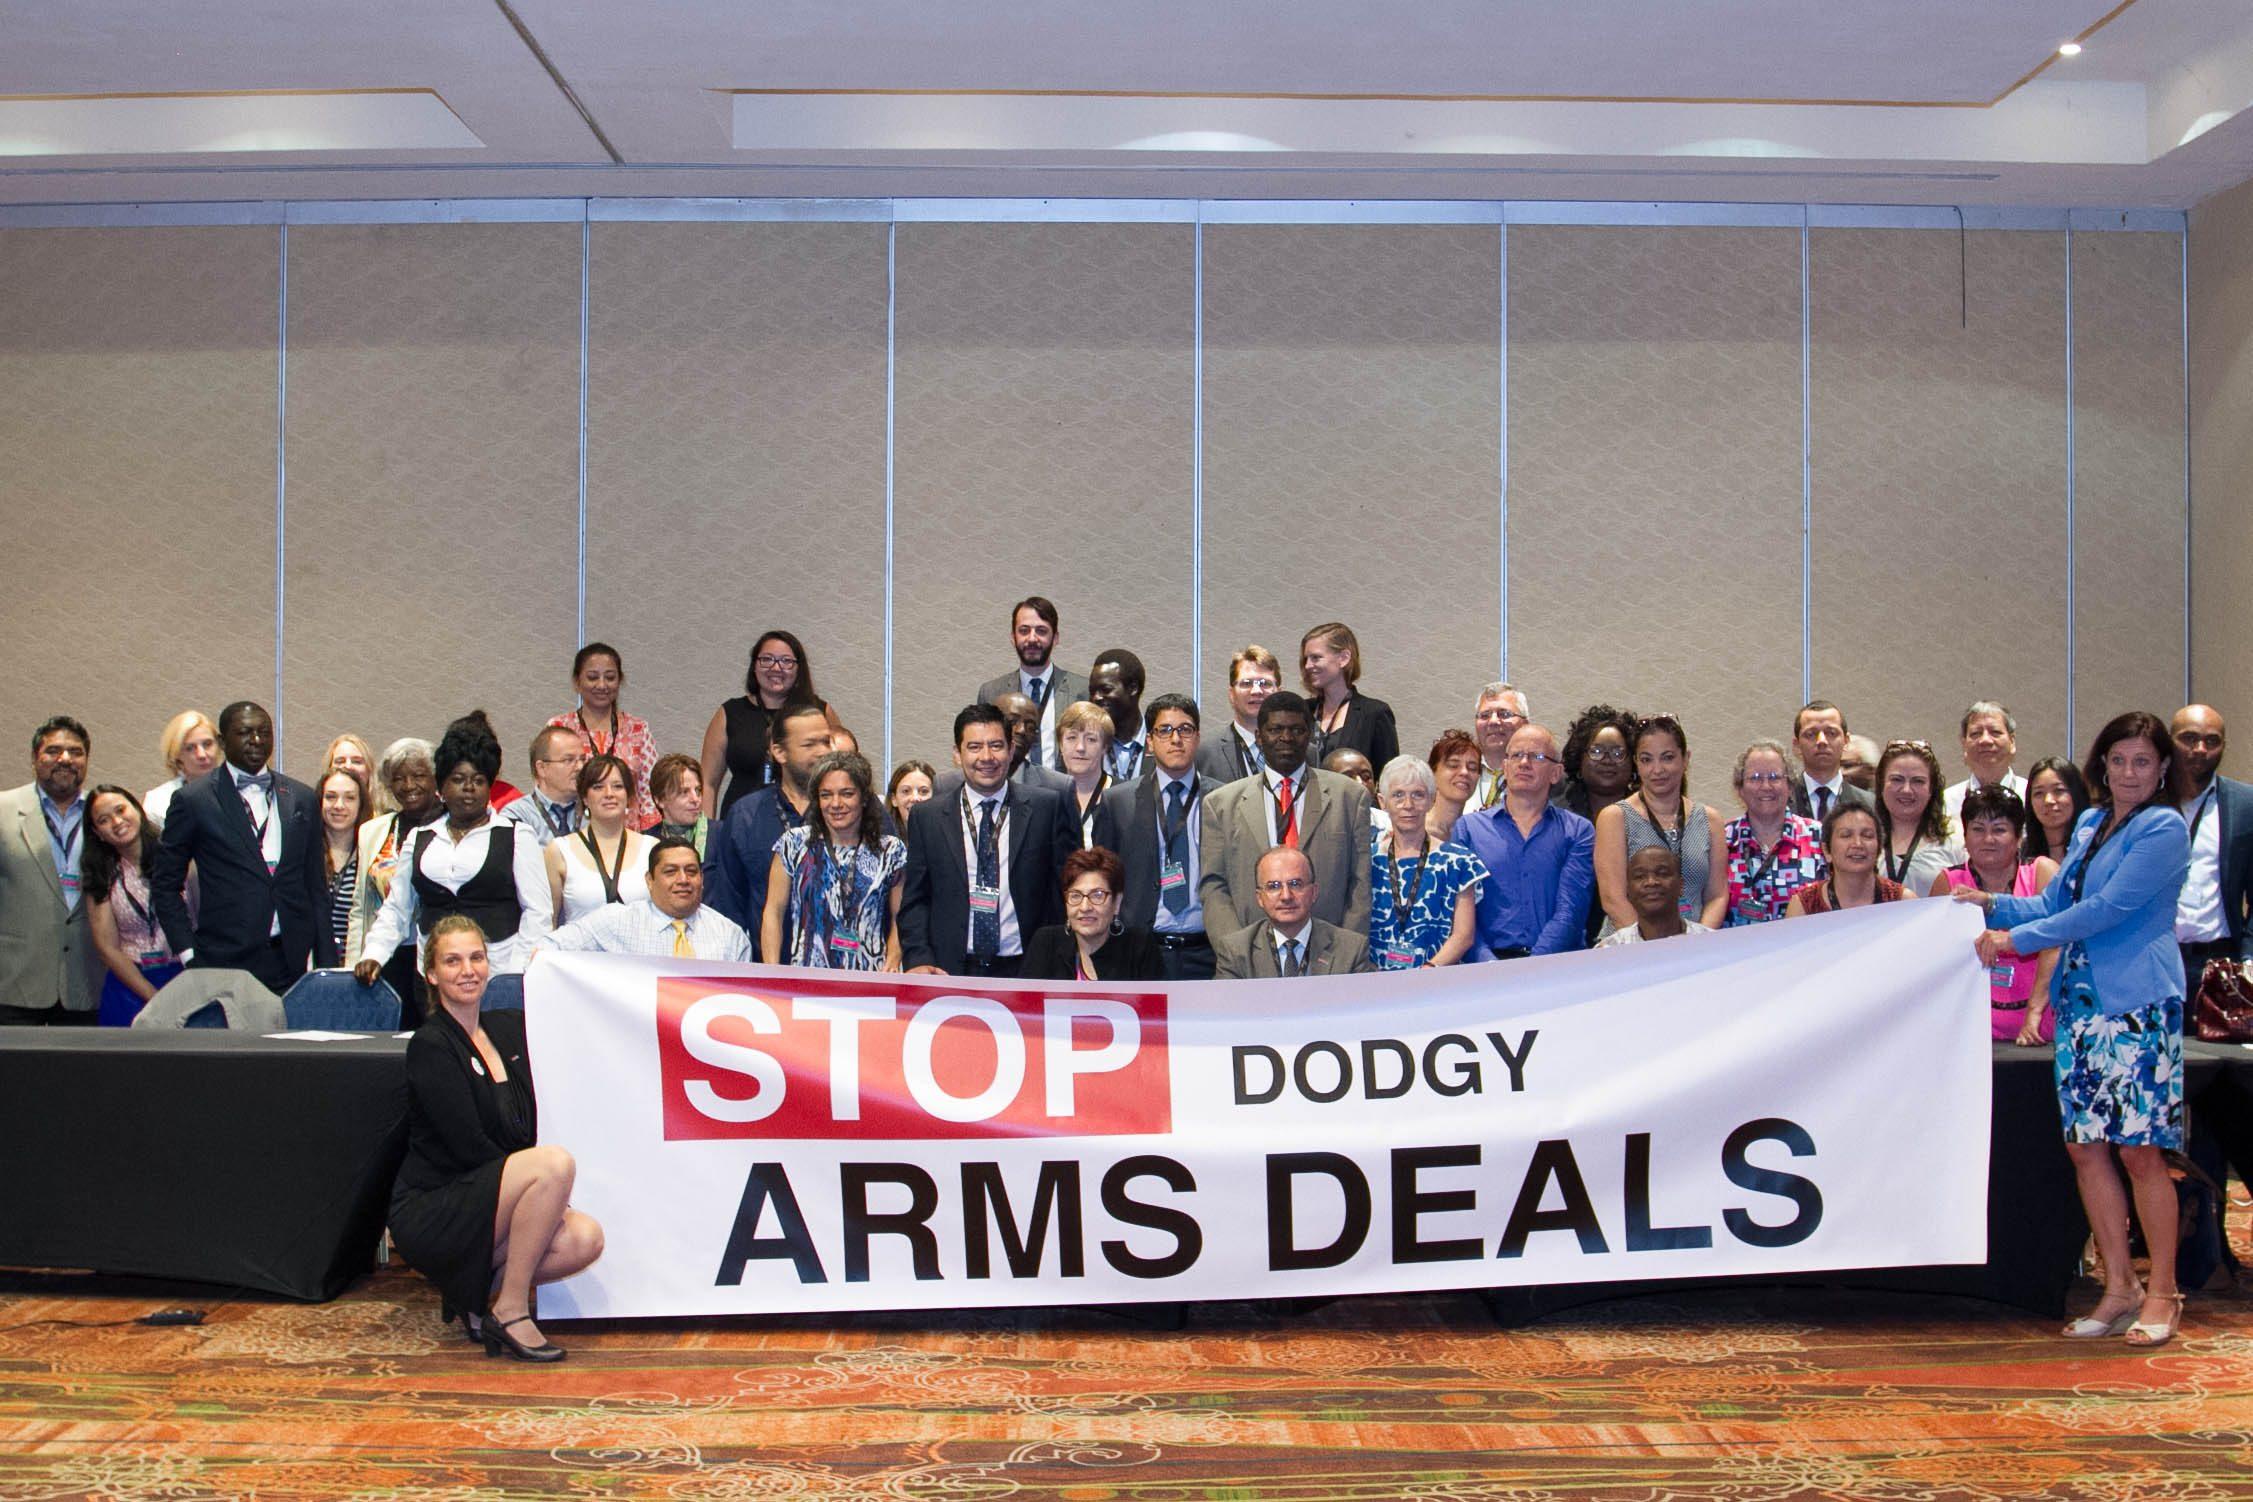 stop-dodgy-arms-deals-stunt-2015.jpg#asset:6152